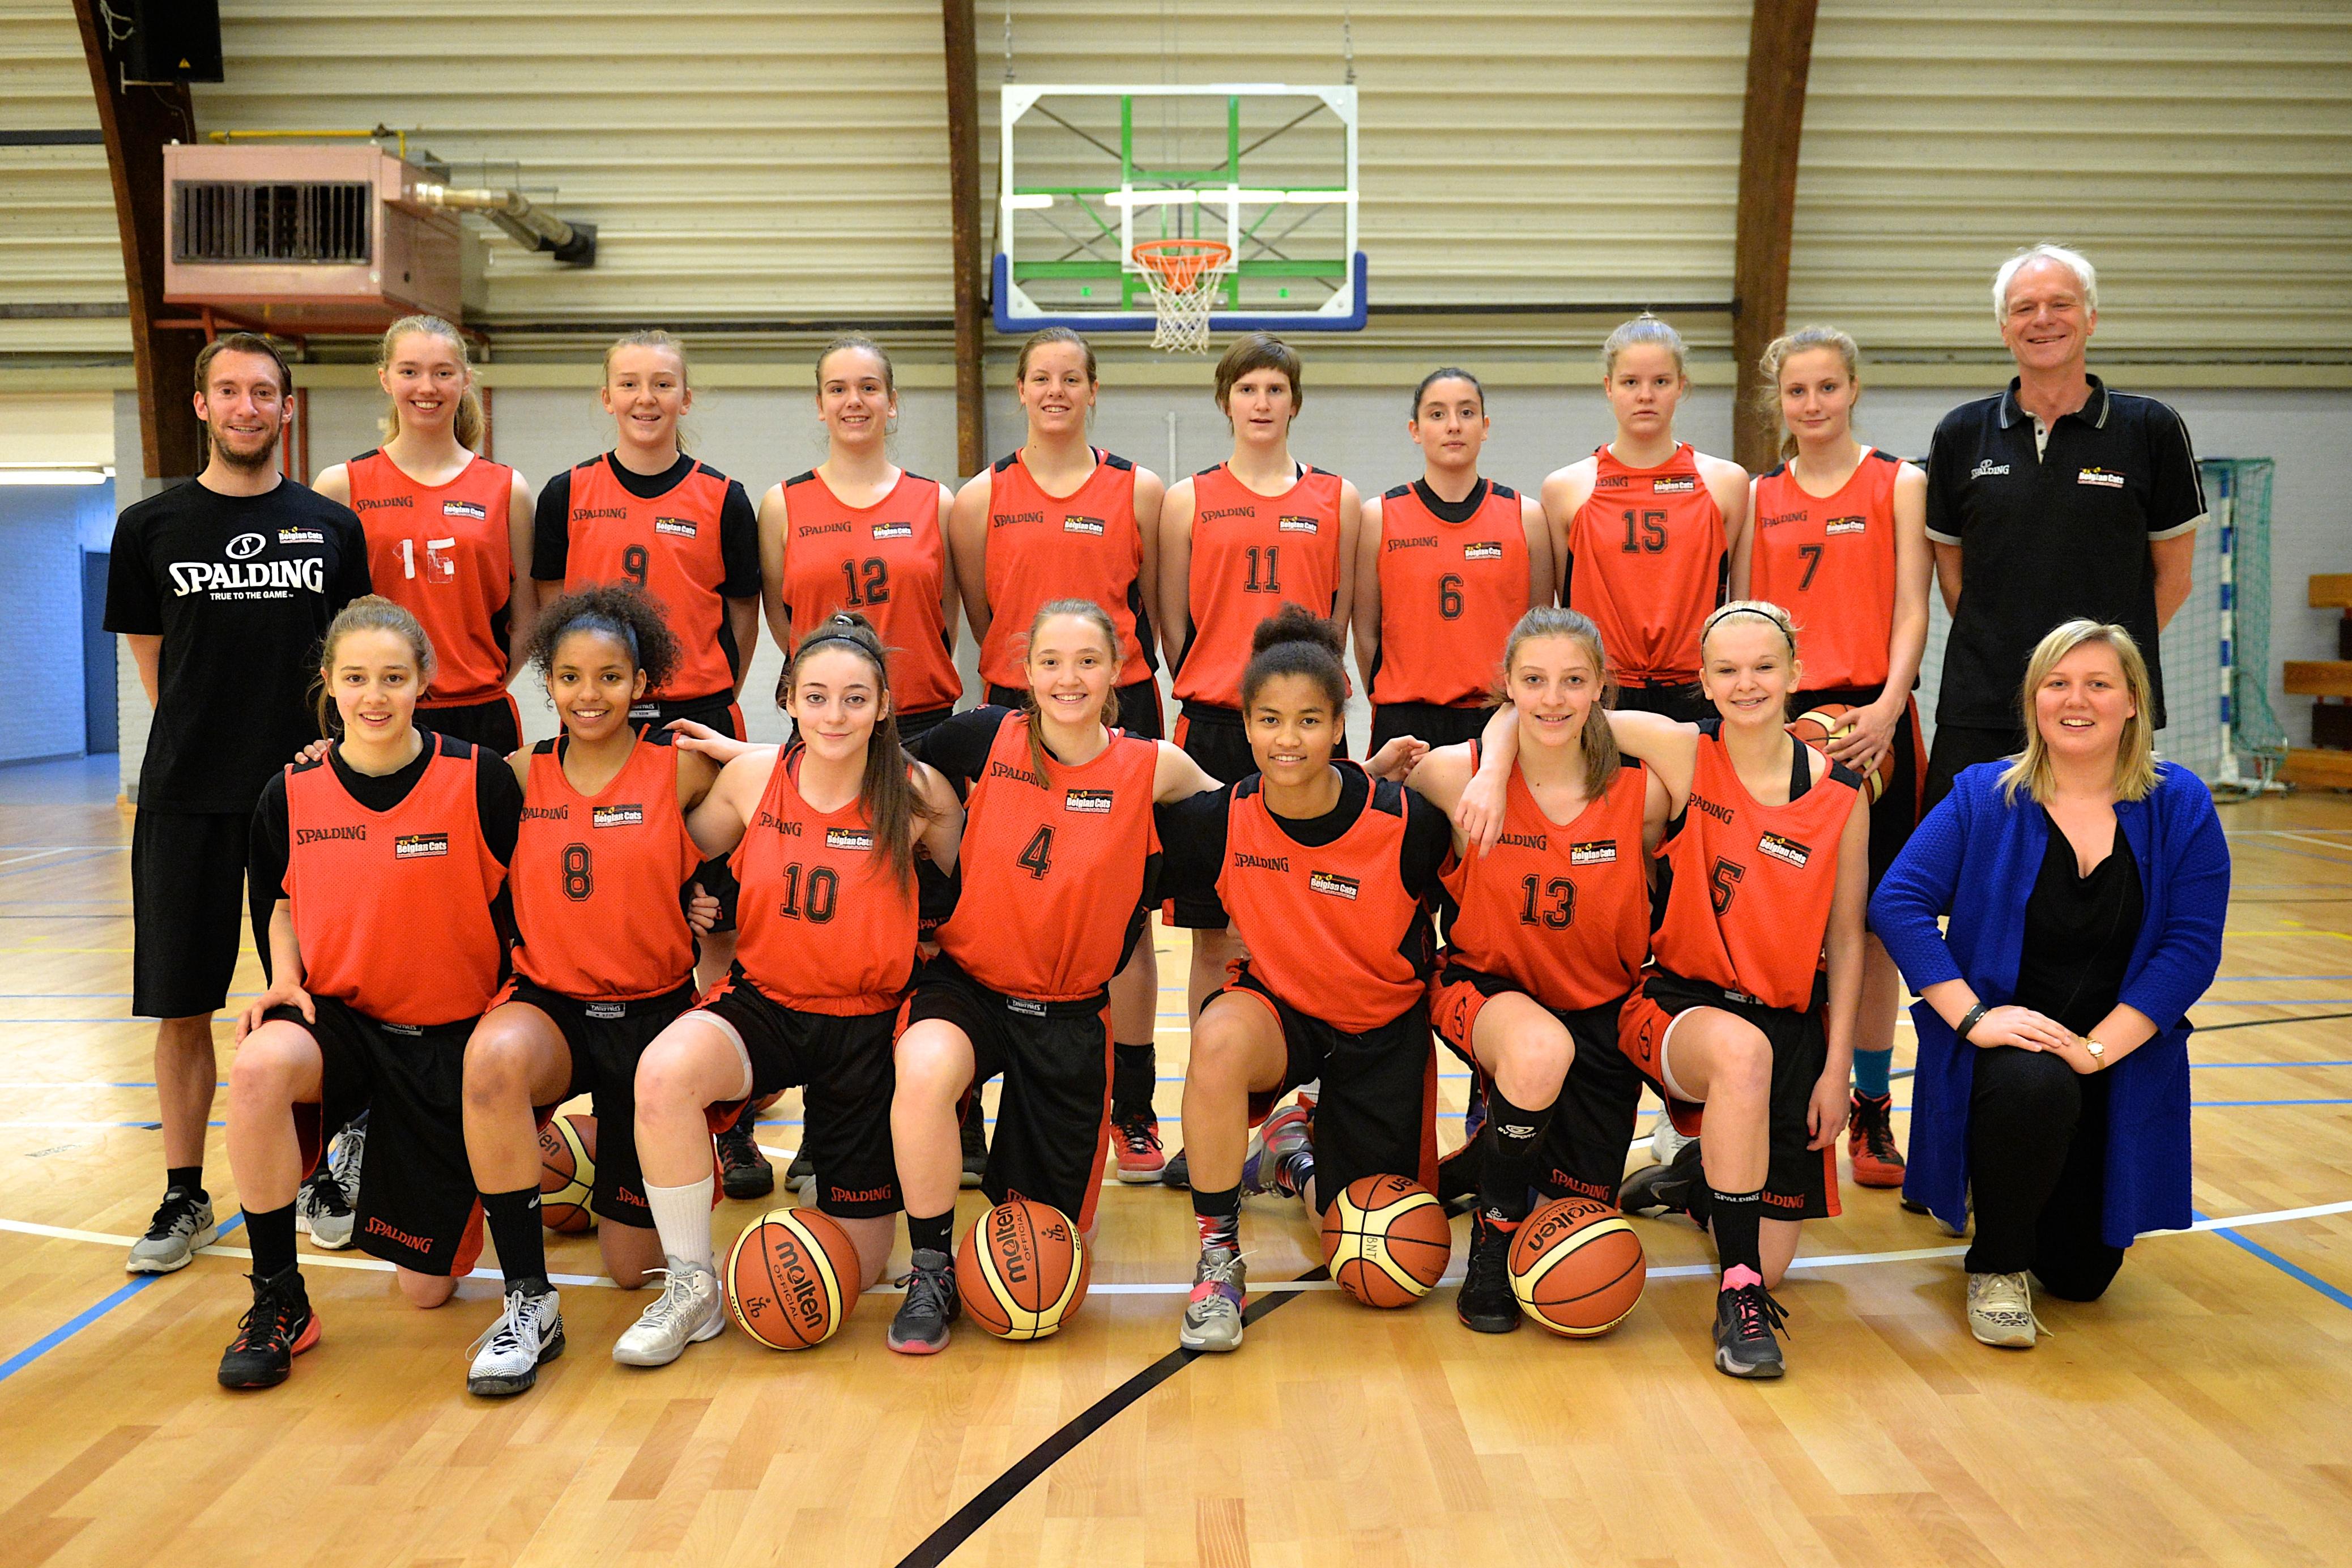 Les U16 (photo: basketbelgium.be)